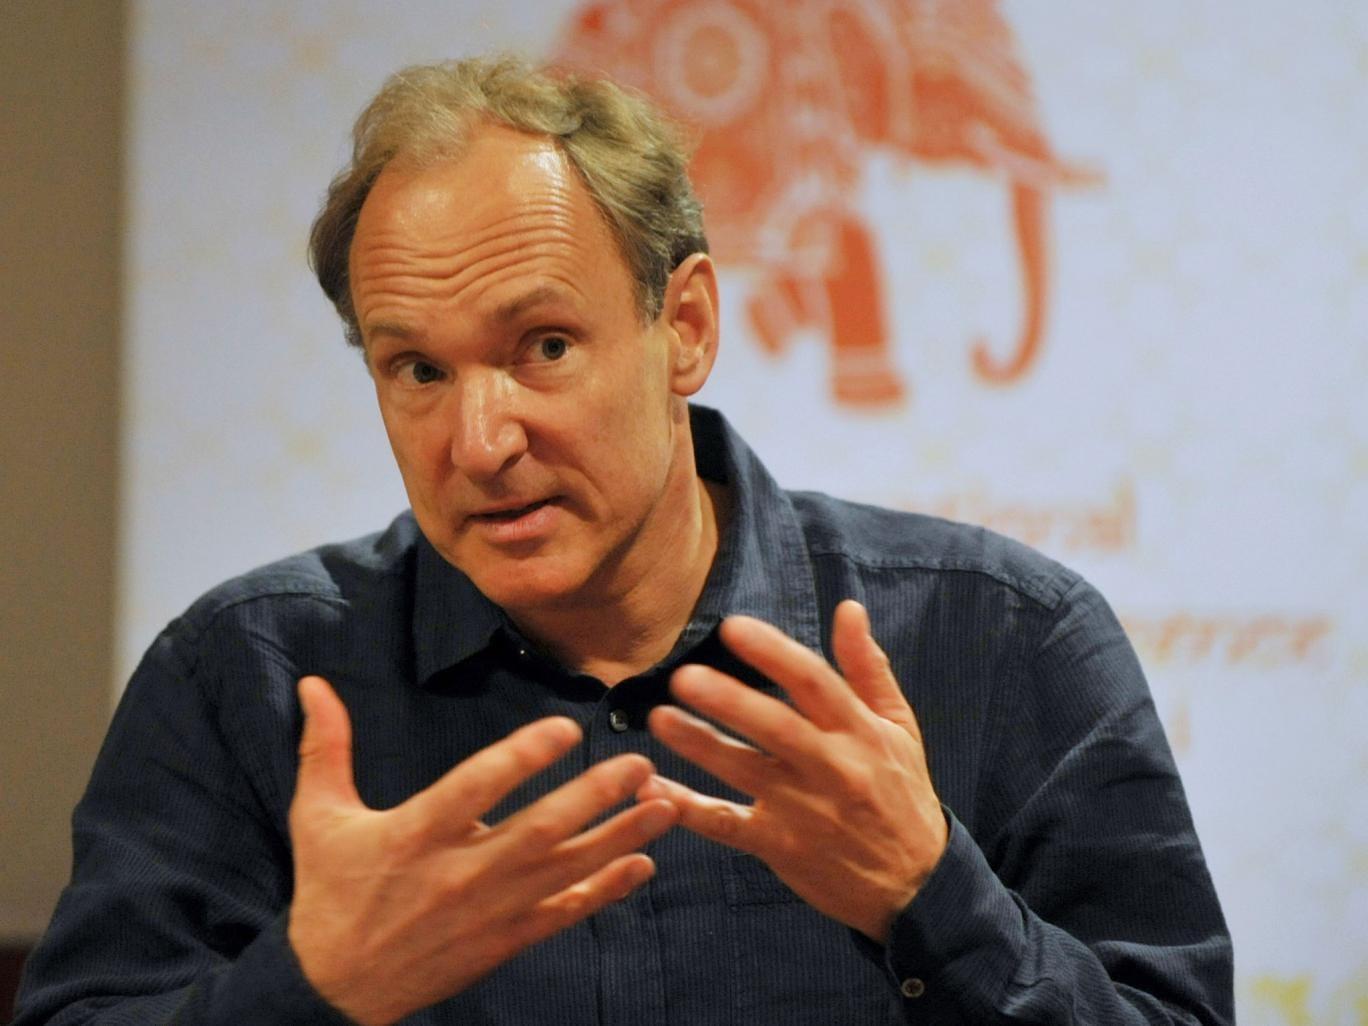 Sir Tim Berners-Lee said growing censorship is threatening democracy